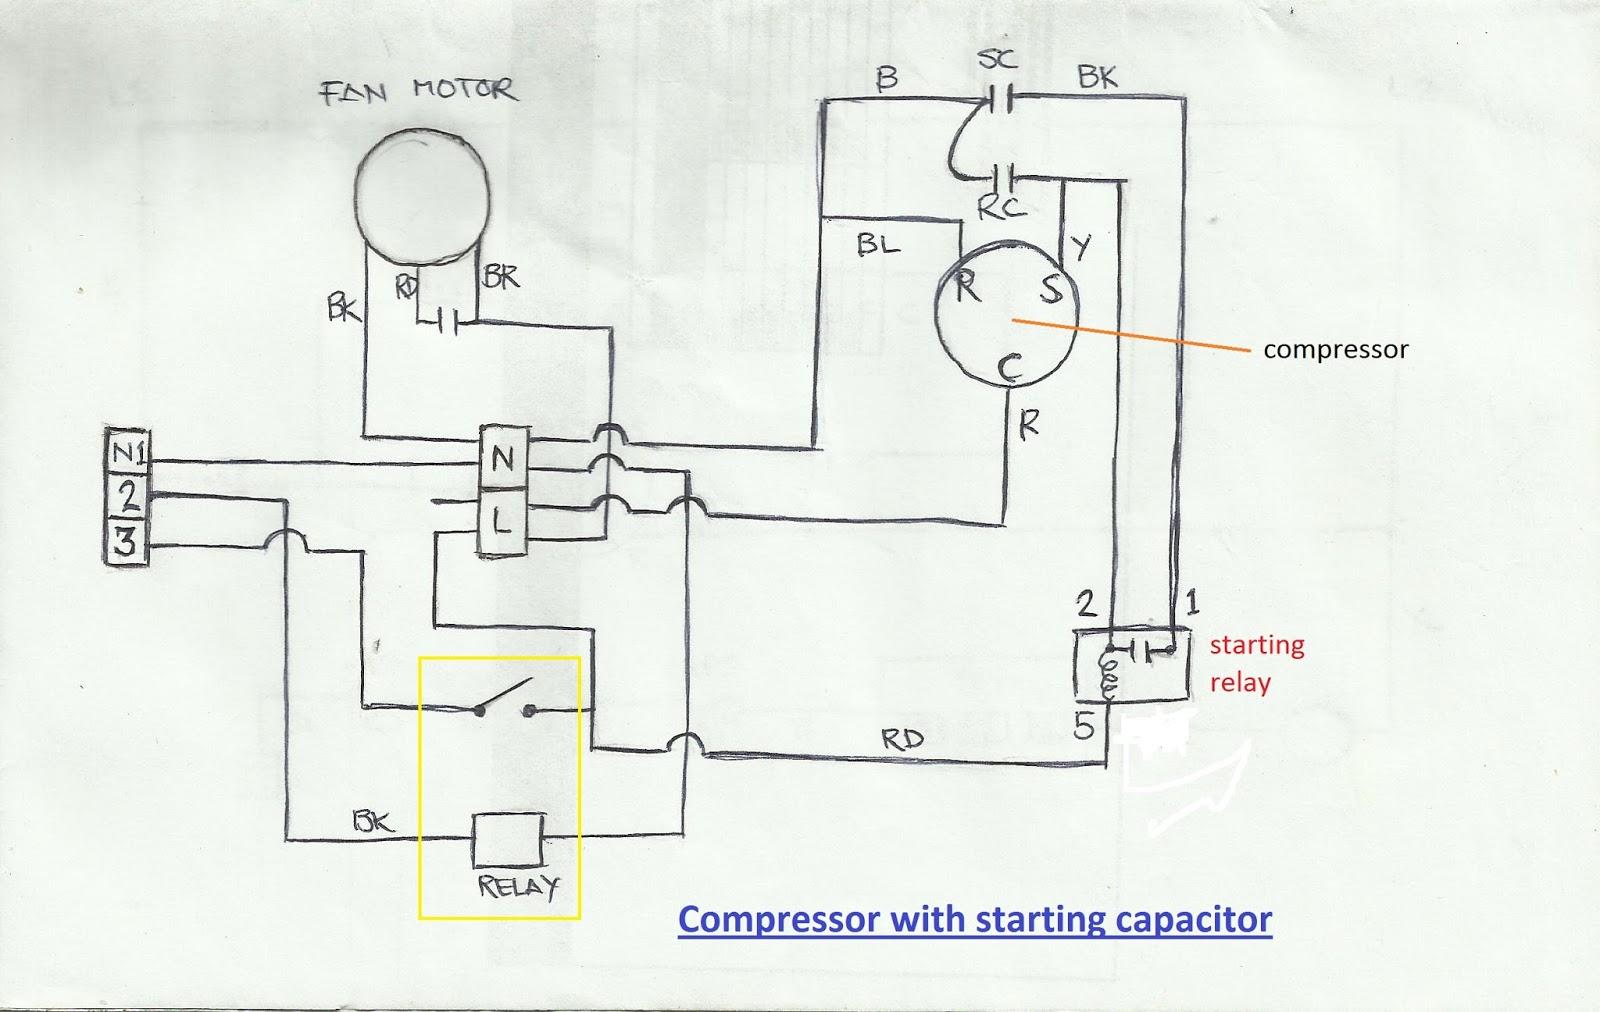 18?resize=840%2C531 fridge compressor wiring diagram periodic & diagrams science kirby compressor wiring diagram at n-0.co